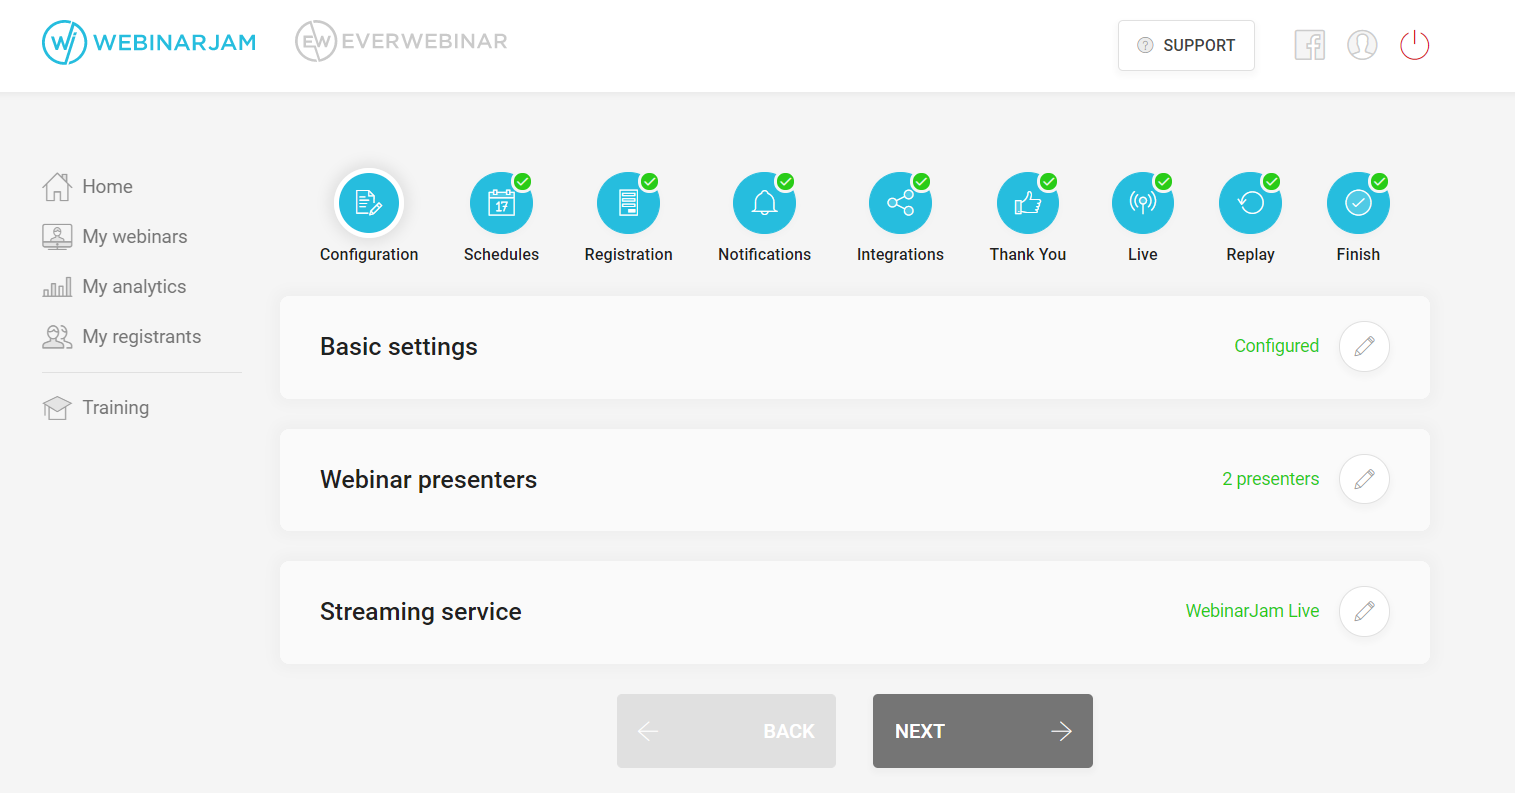 herramientas para nomadas digitales (webinars)